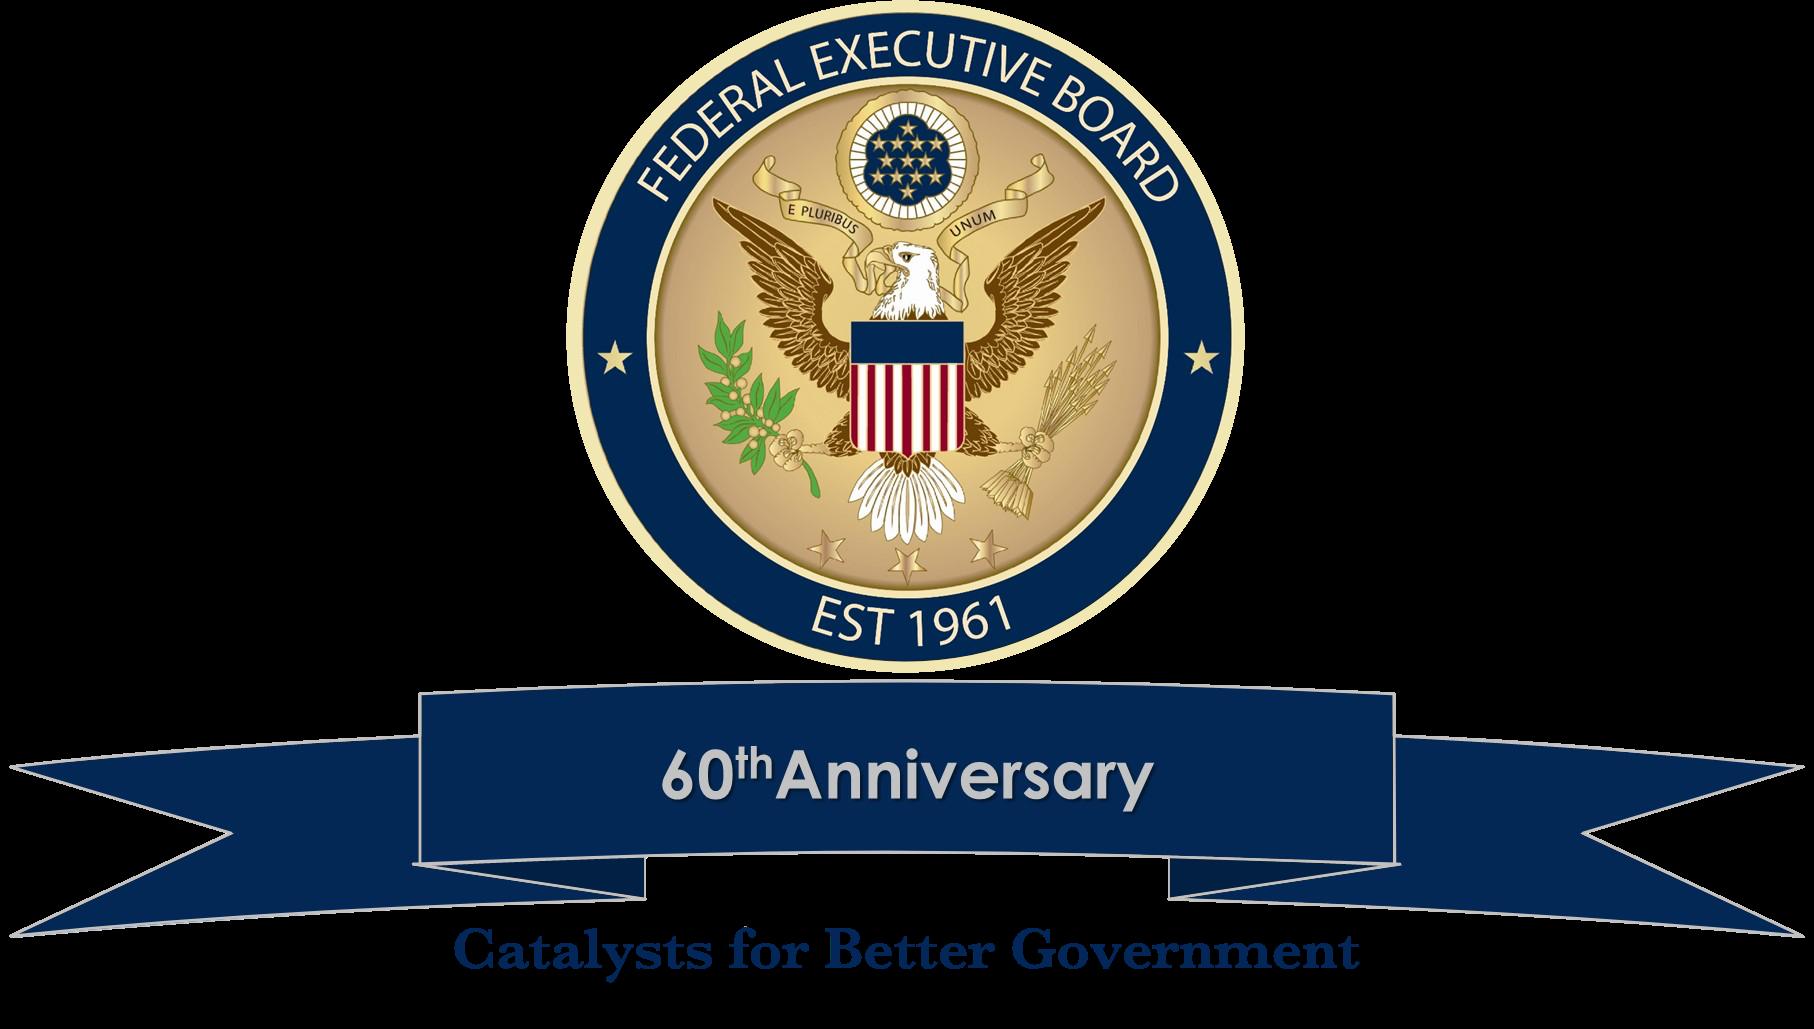 FEB 60th Anniversary